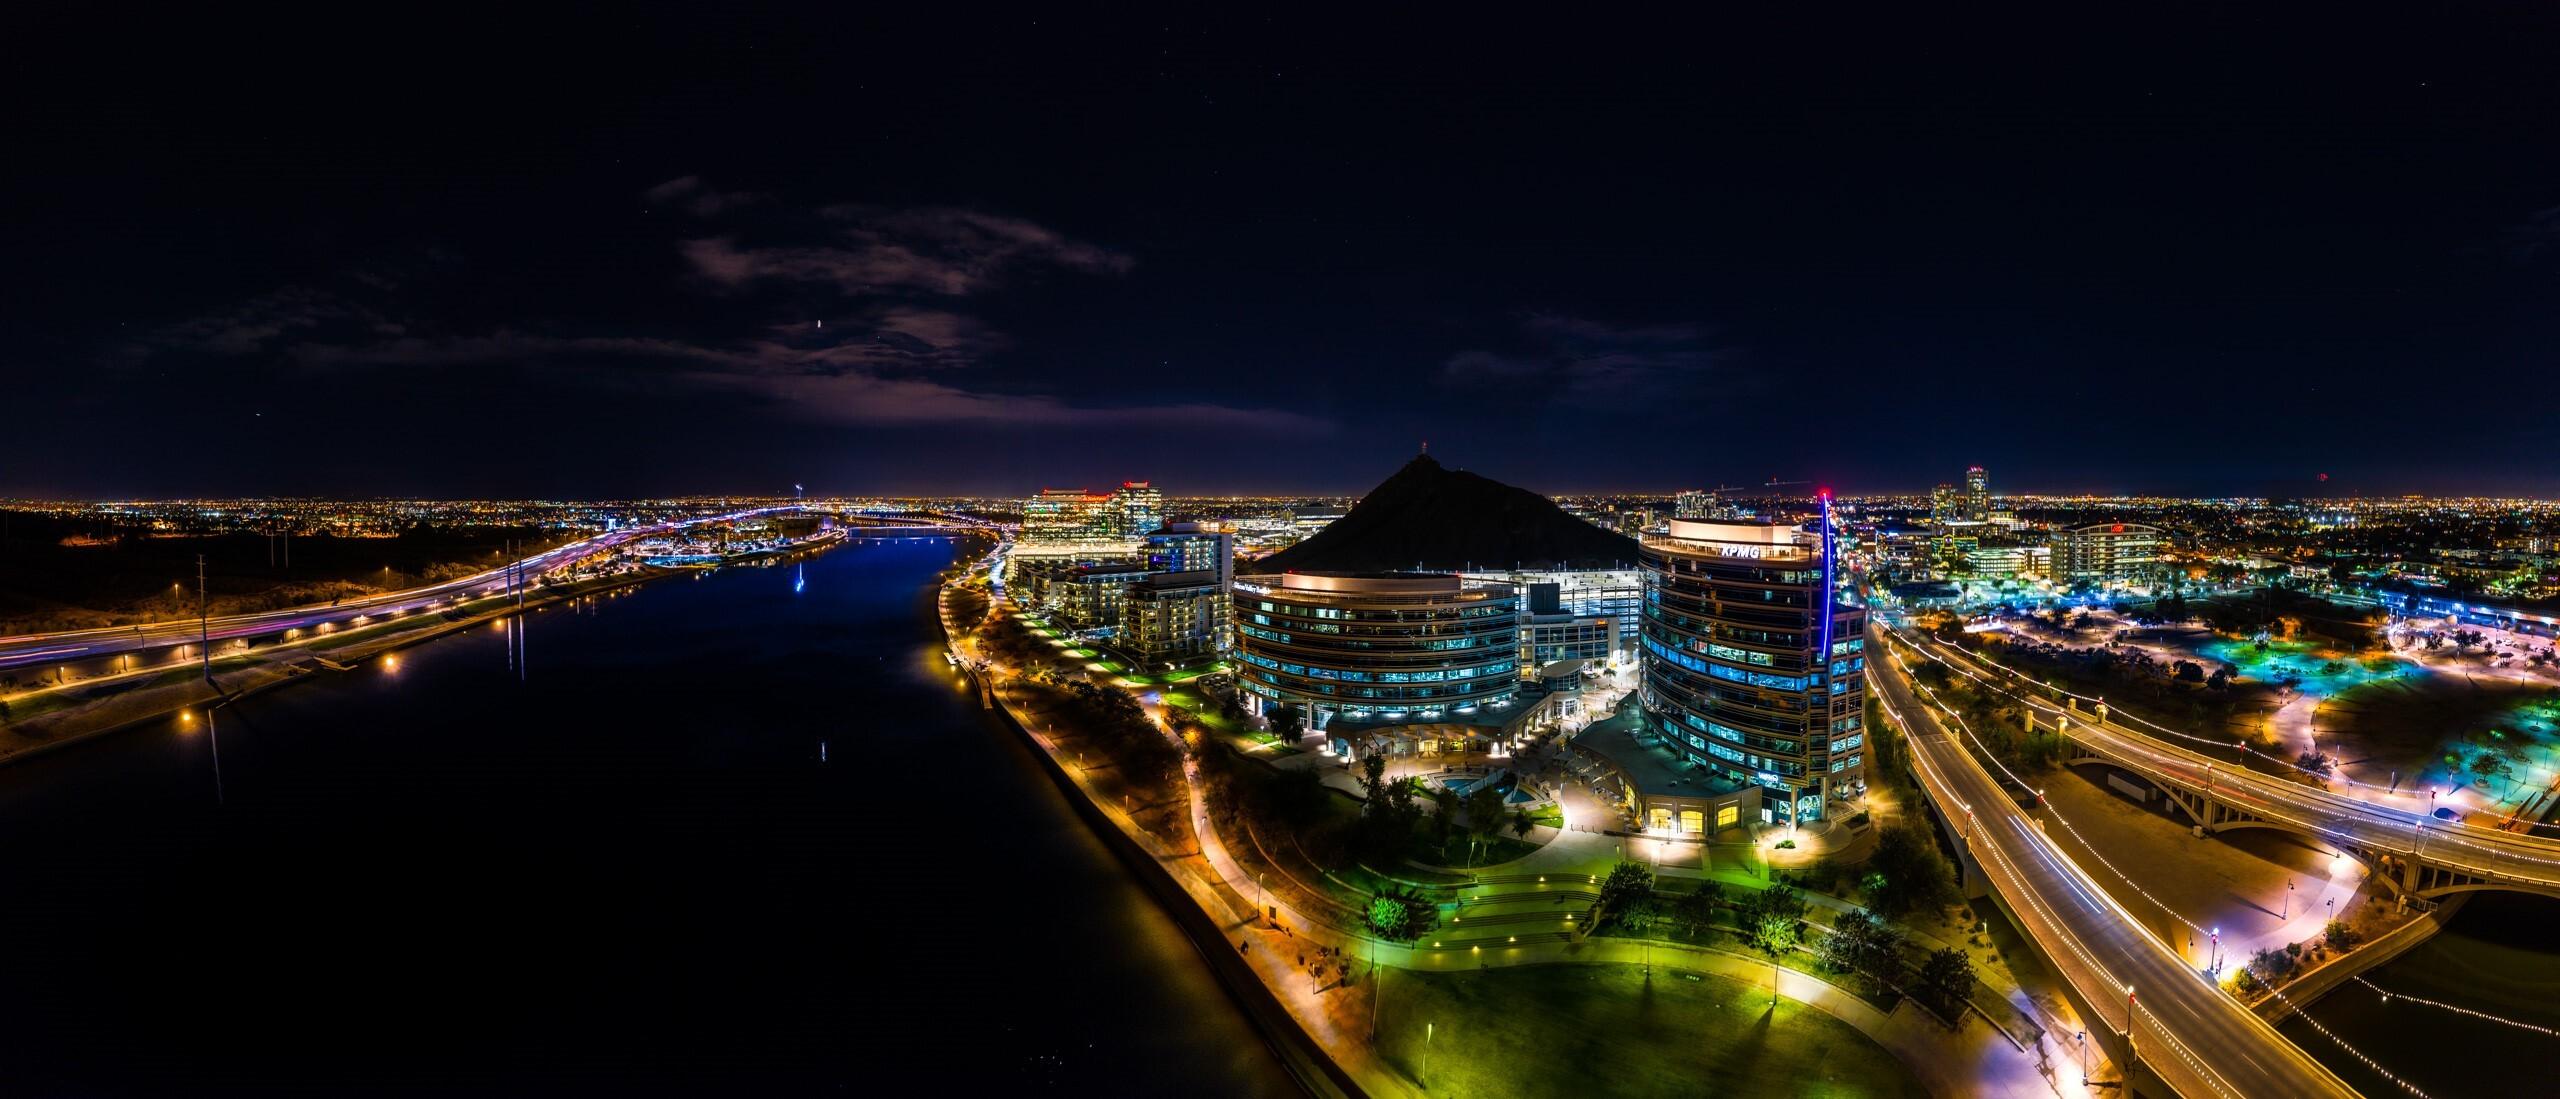 Building Tempe Award - Alex Harris lake aerial at night.jpg